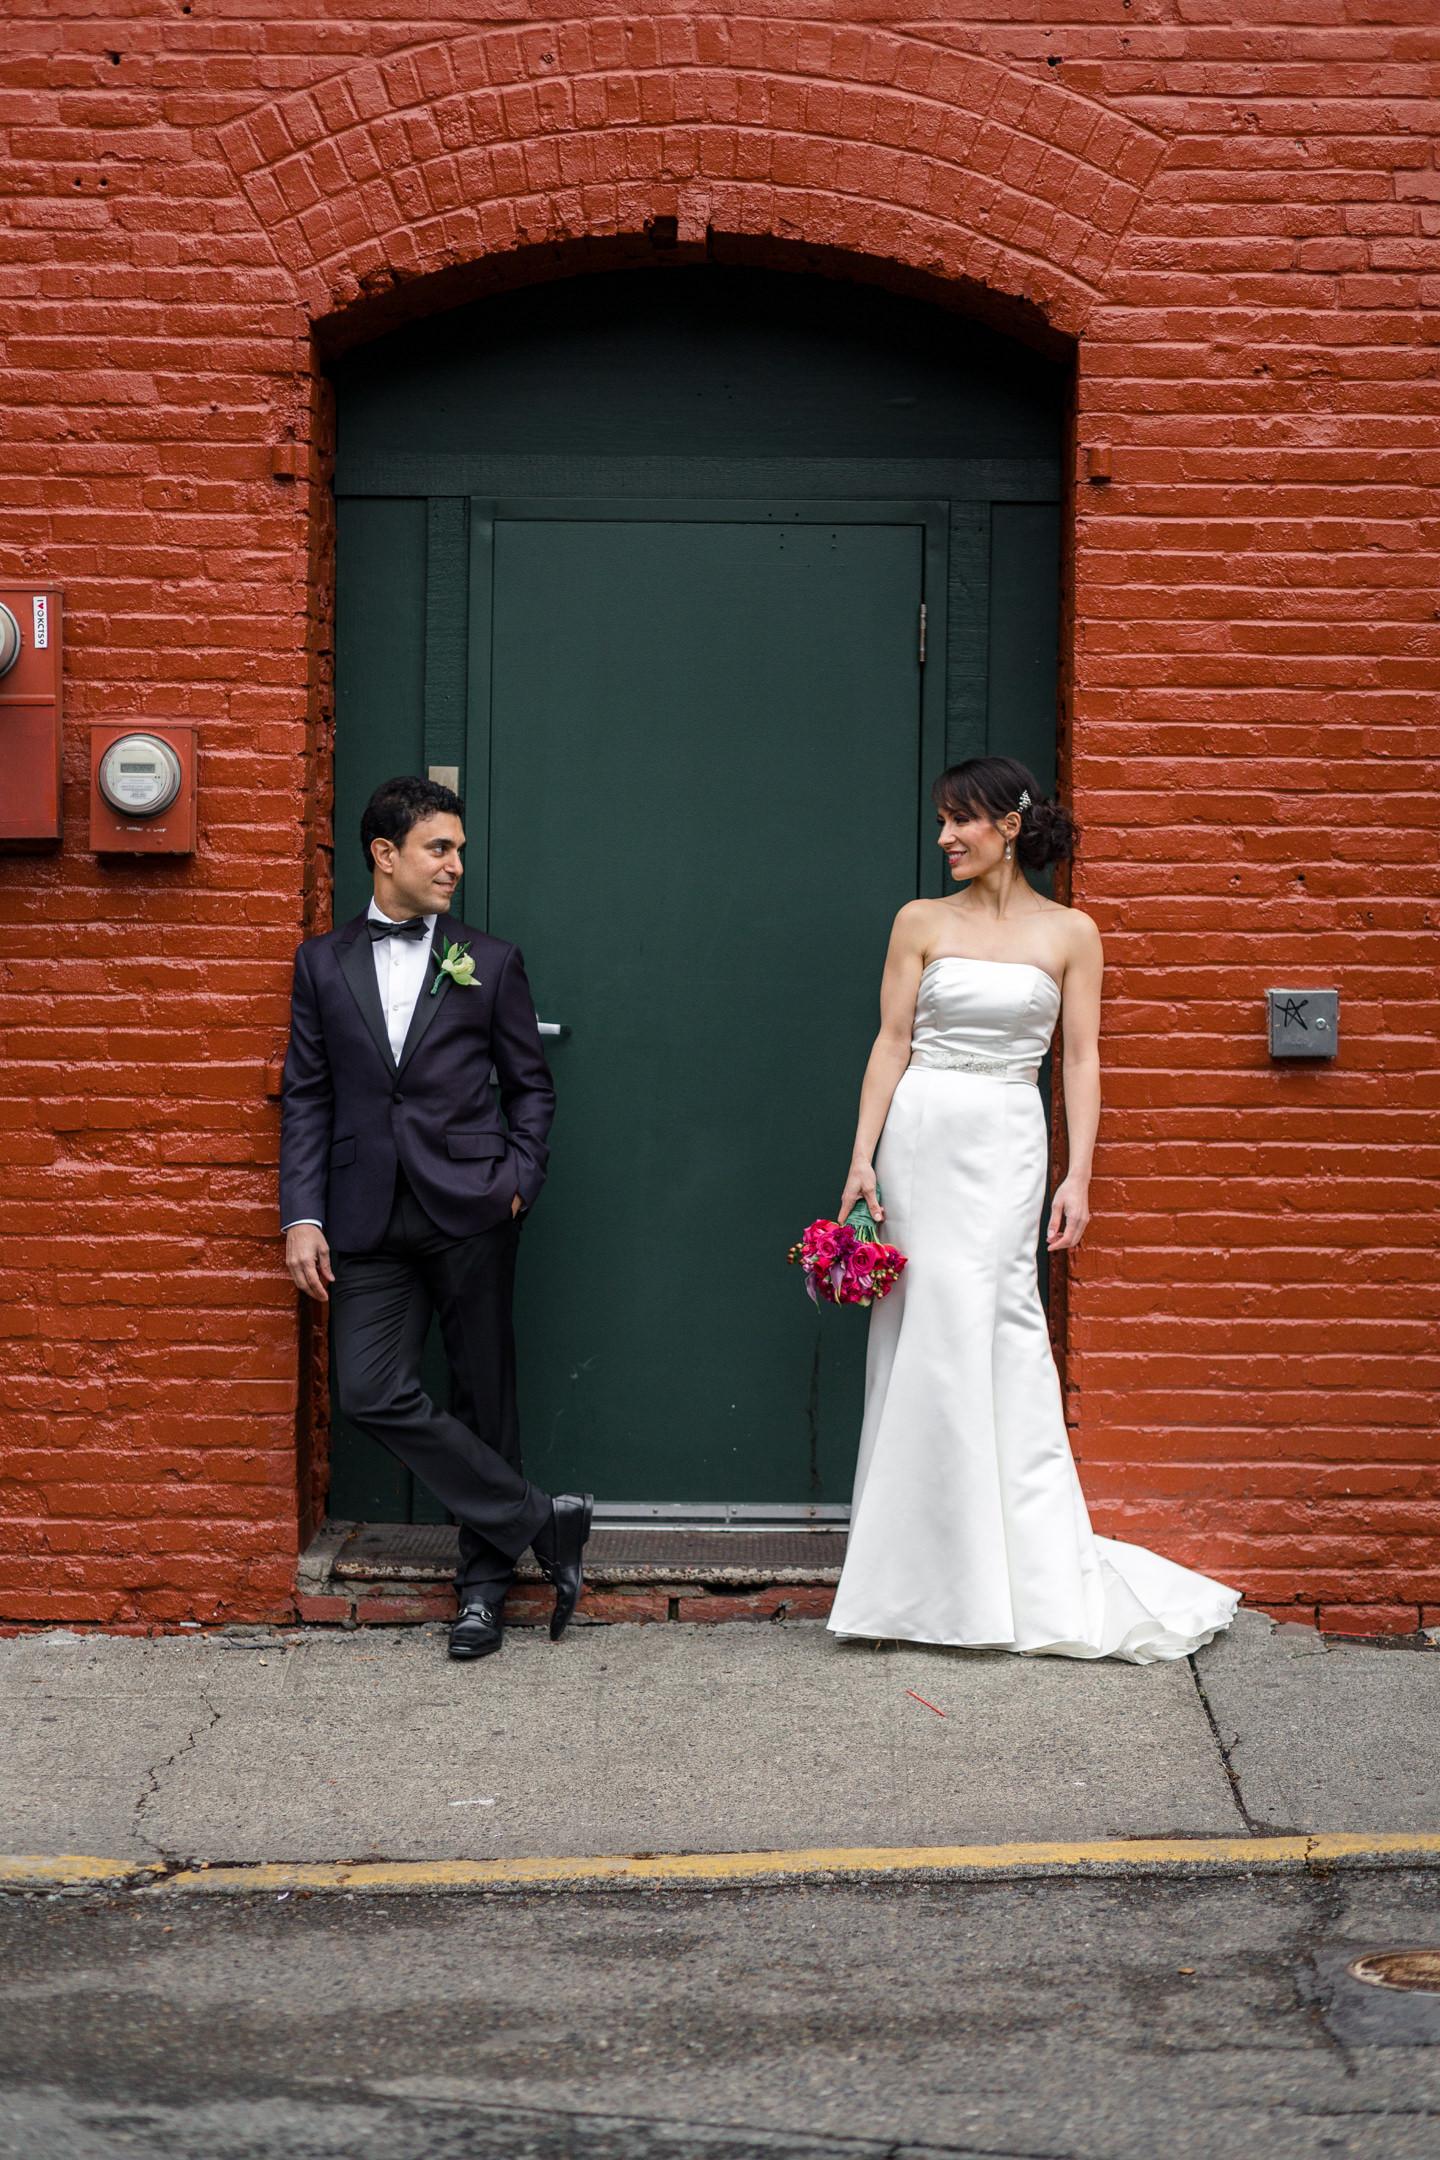 Documentary-Wedding-Photography-Andrew-Tat-Maria & AJ-08.jpg